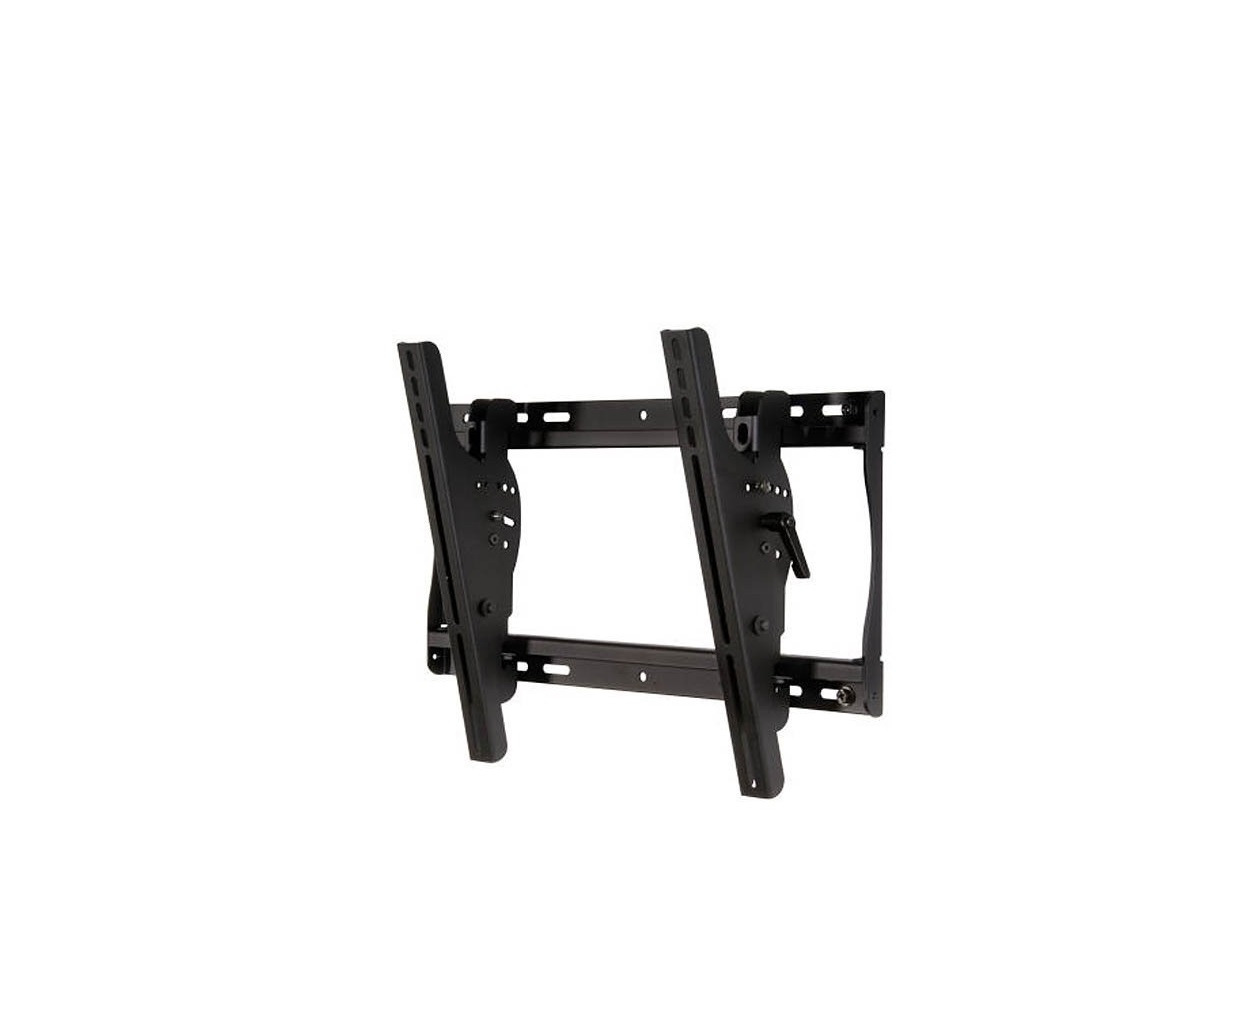 Peerless SmartMount Universal Tilt Wall Mount For 32 To 50 Flat Panel Displays Black ST640